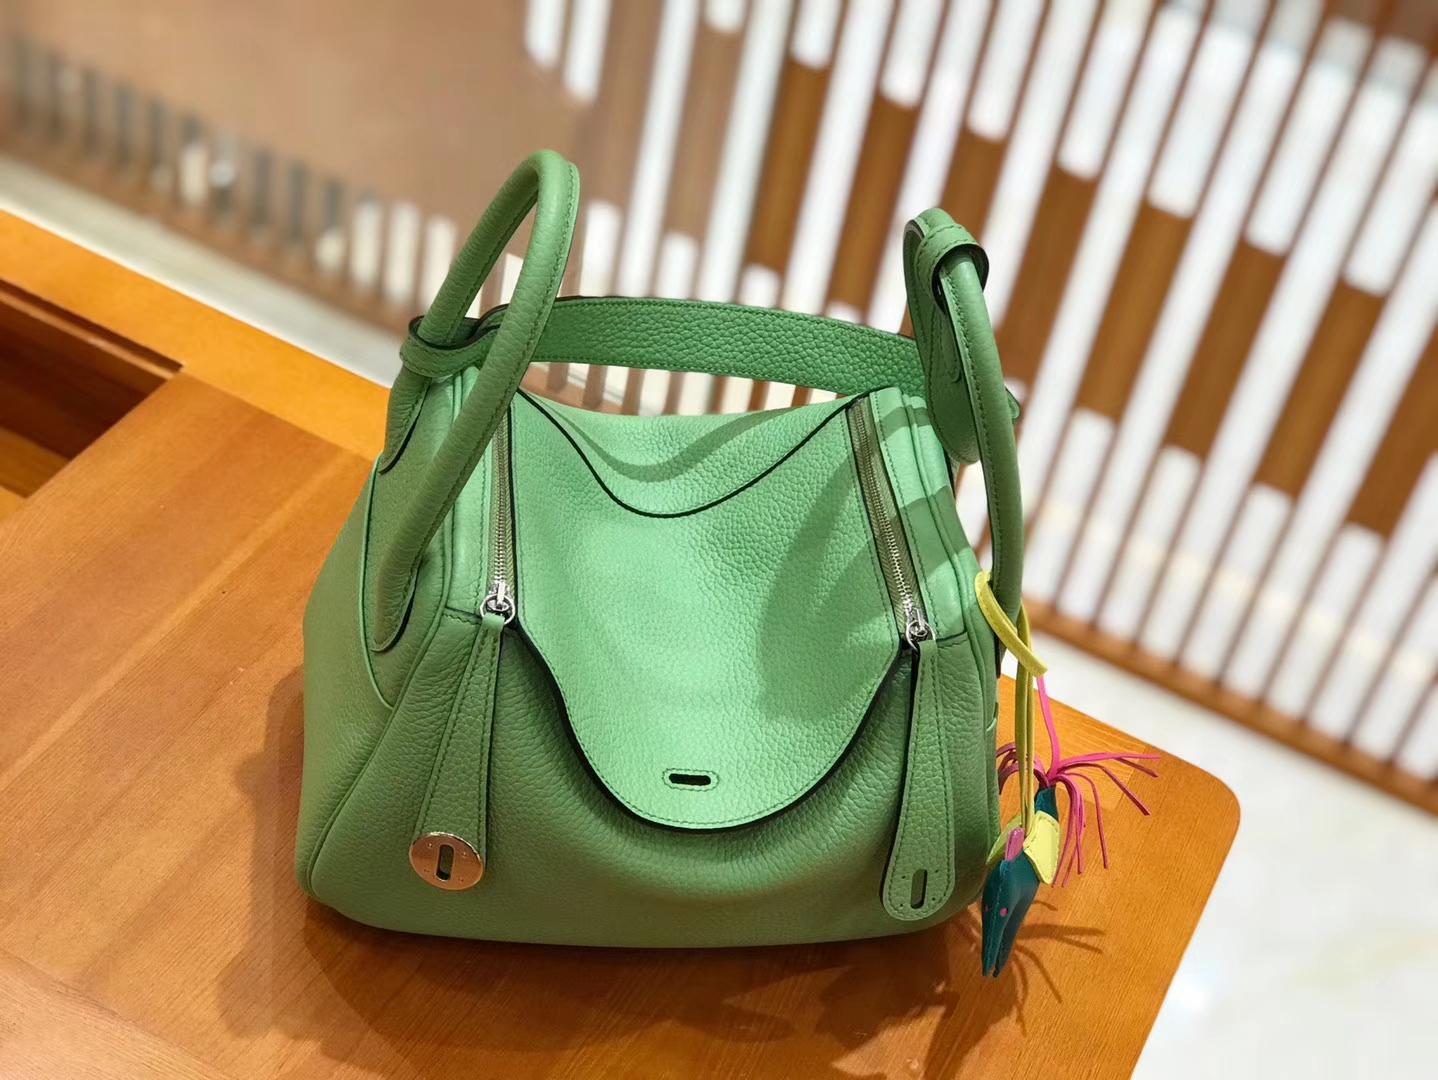 Hermès(爱马仕)Lindy 26cm togo 牛油果绿 全手工缝制 现货